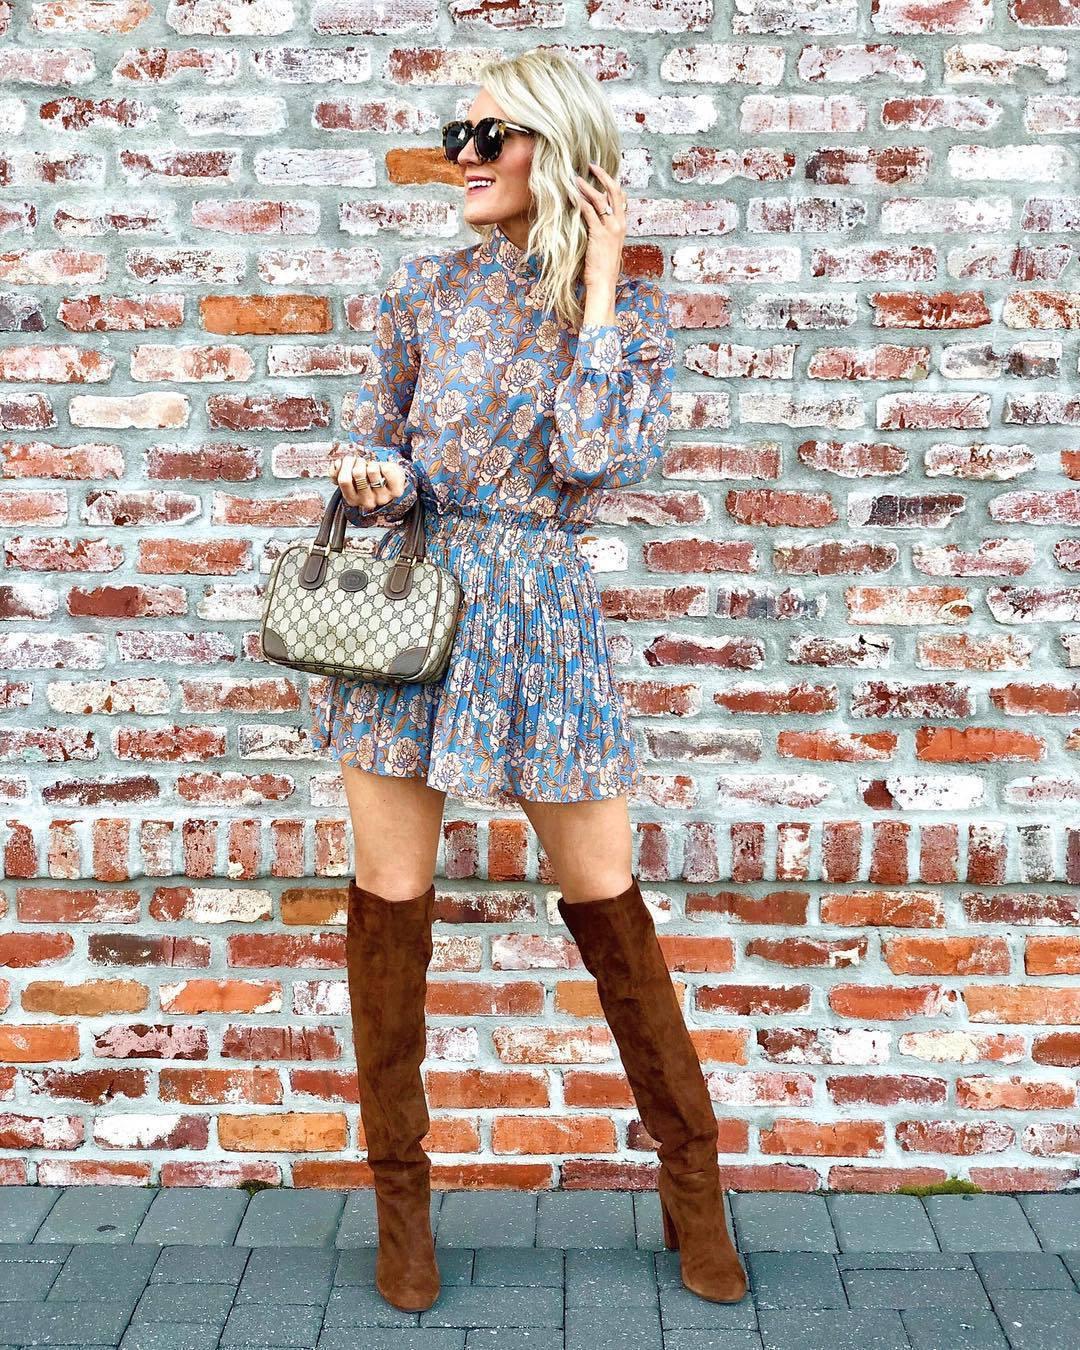 dress mini dress blue dress pleated dress floral dress long sleeve dress over the knee boots brown boots heel boots handbag black sunglasses skirt mini skirt shirt floral skirt floral shirt pleated skirt set sunglasses